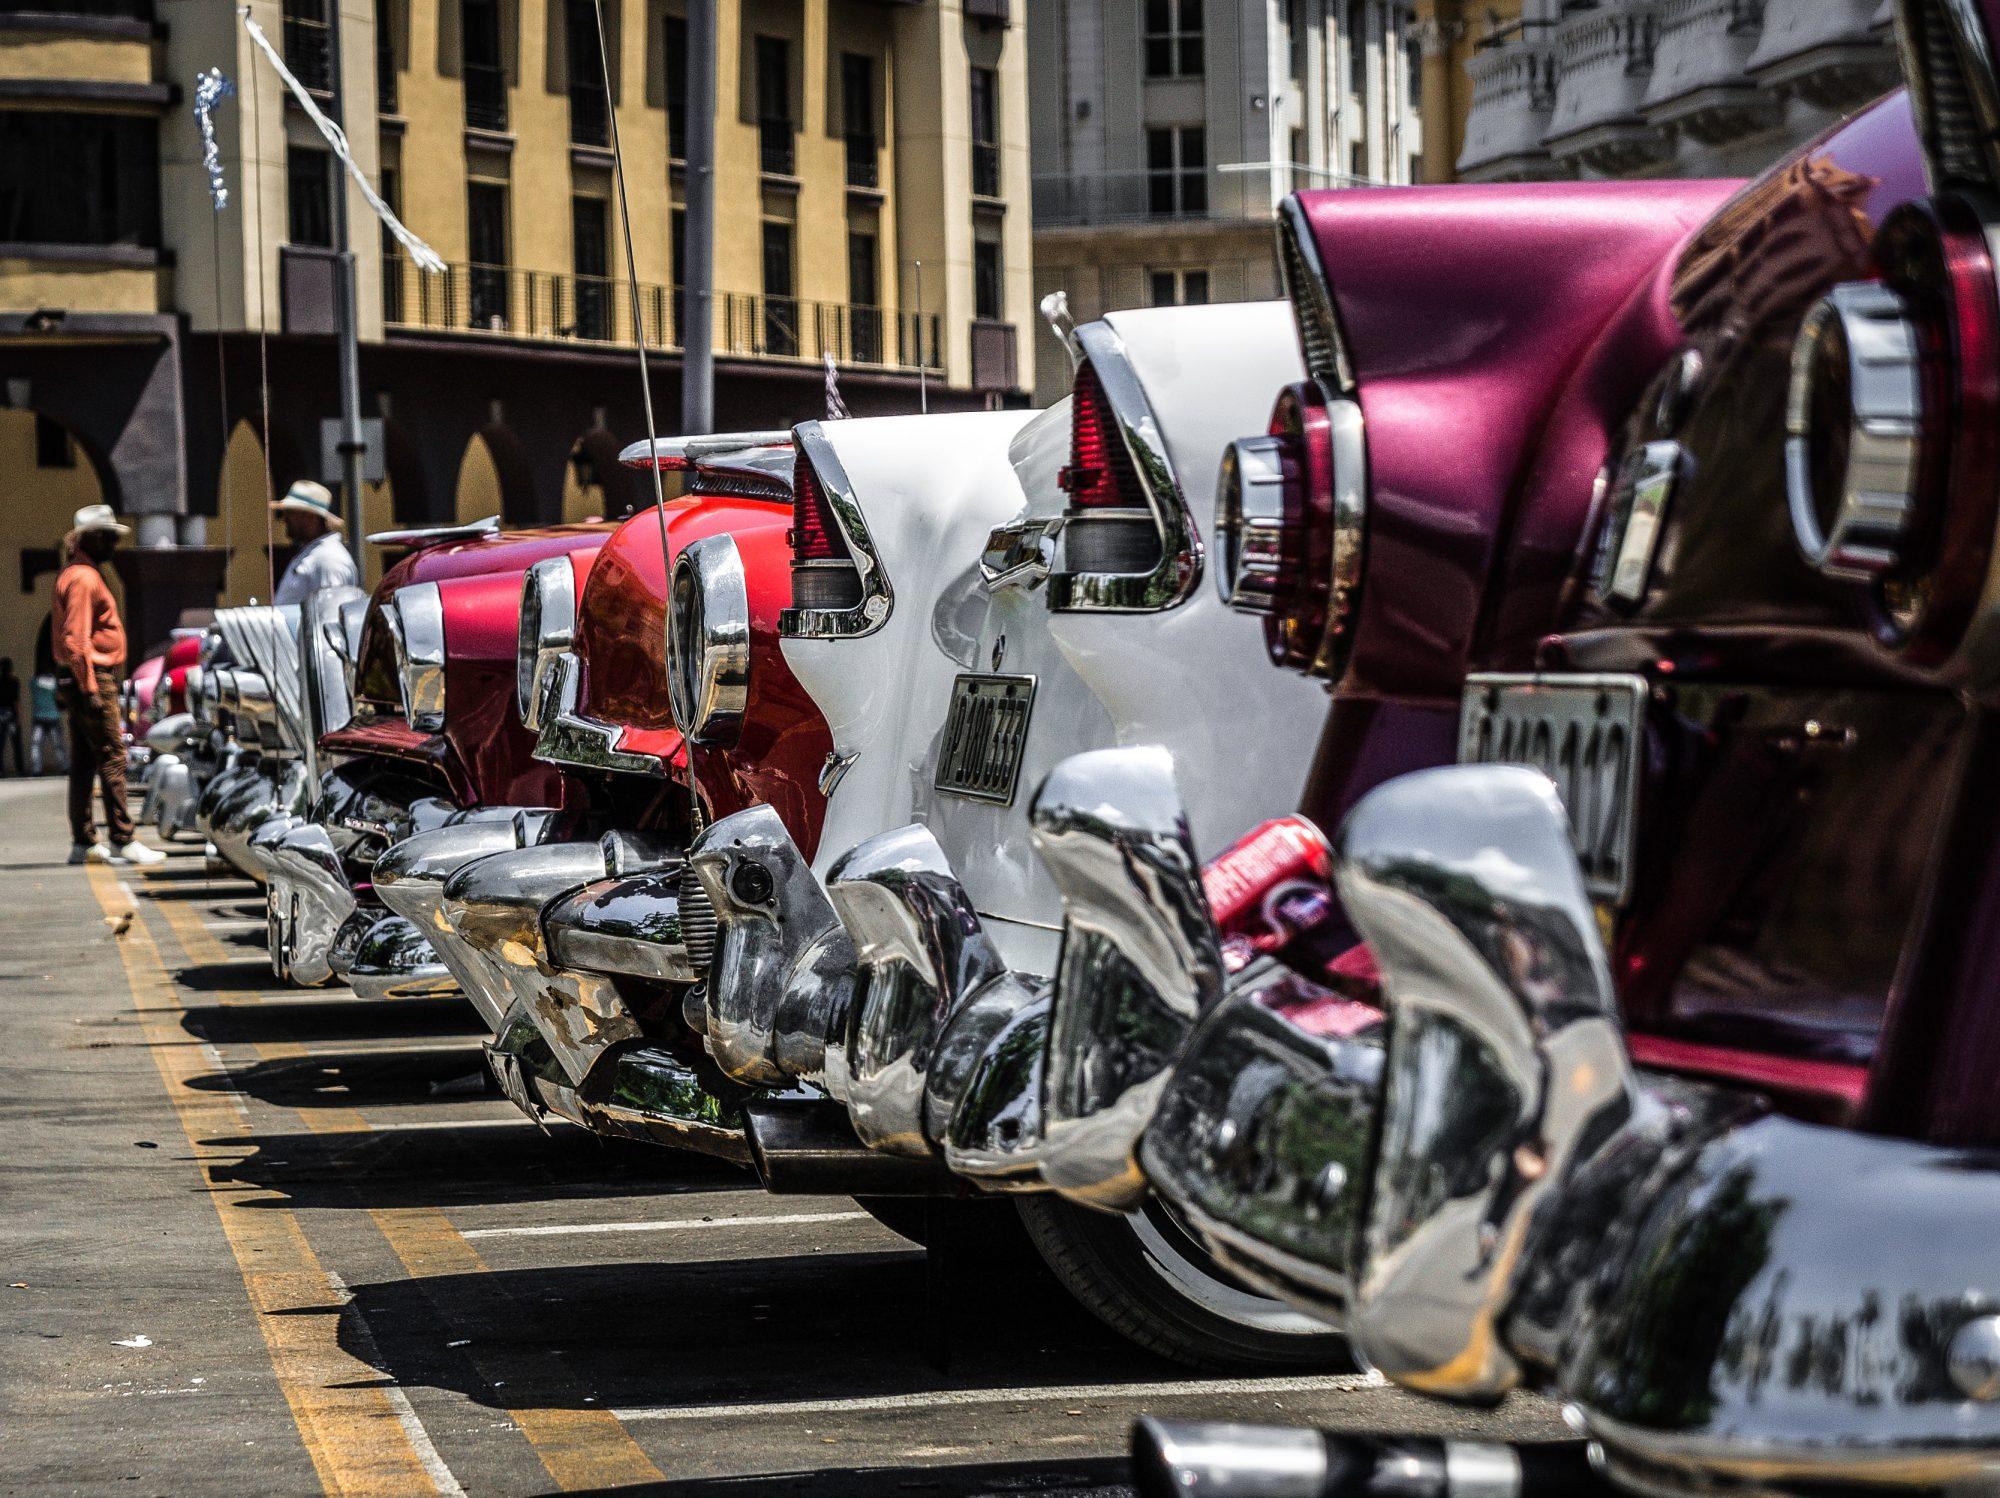 Vintage American cars in Havana Cuba on SelfishMe Travel LLC